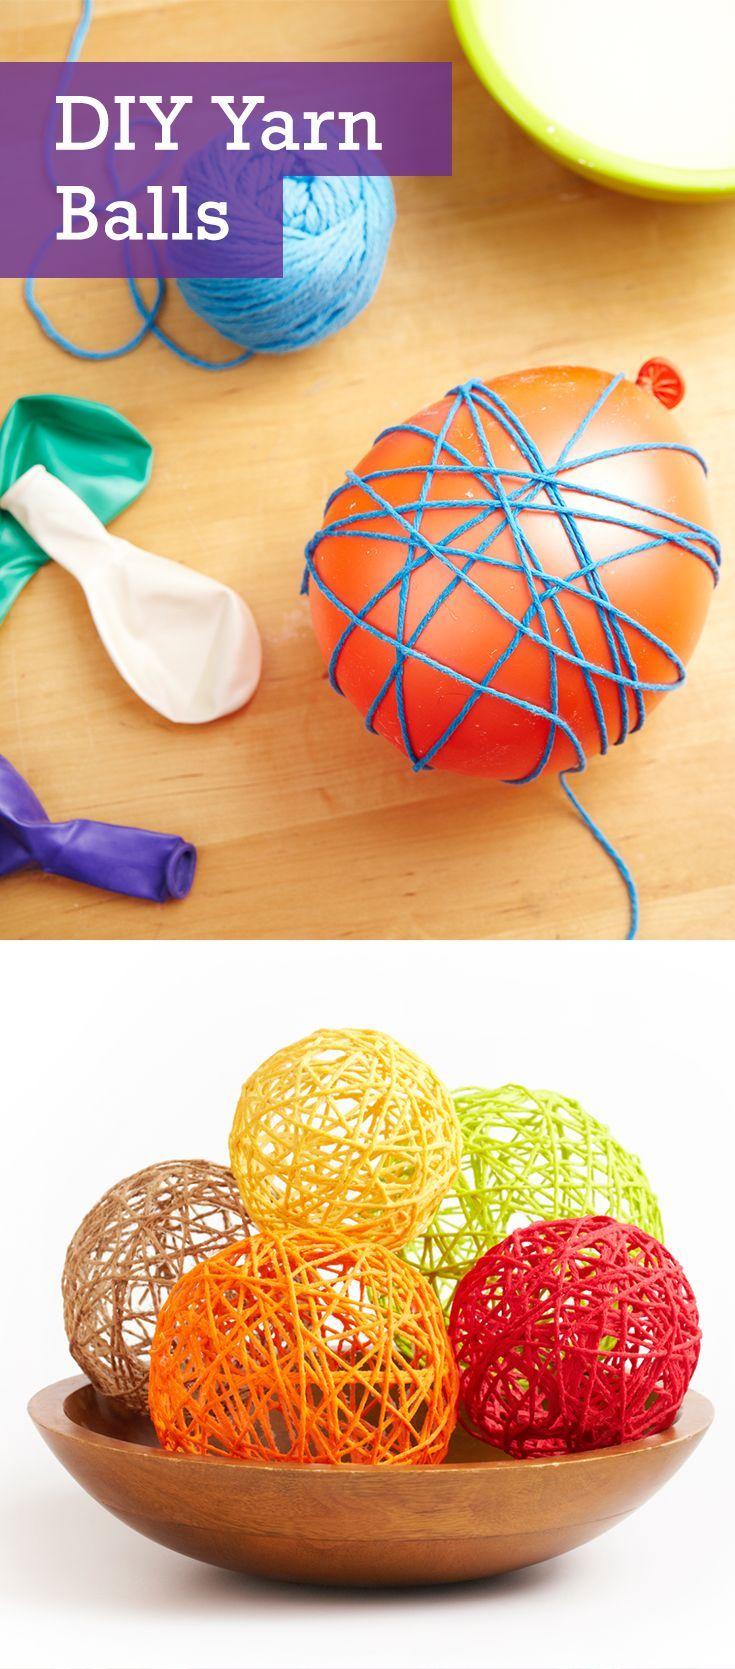 fun with yarn crafts ideas yarn ball yarns and craft